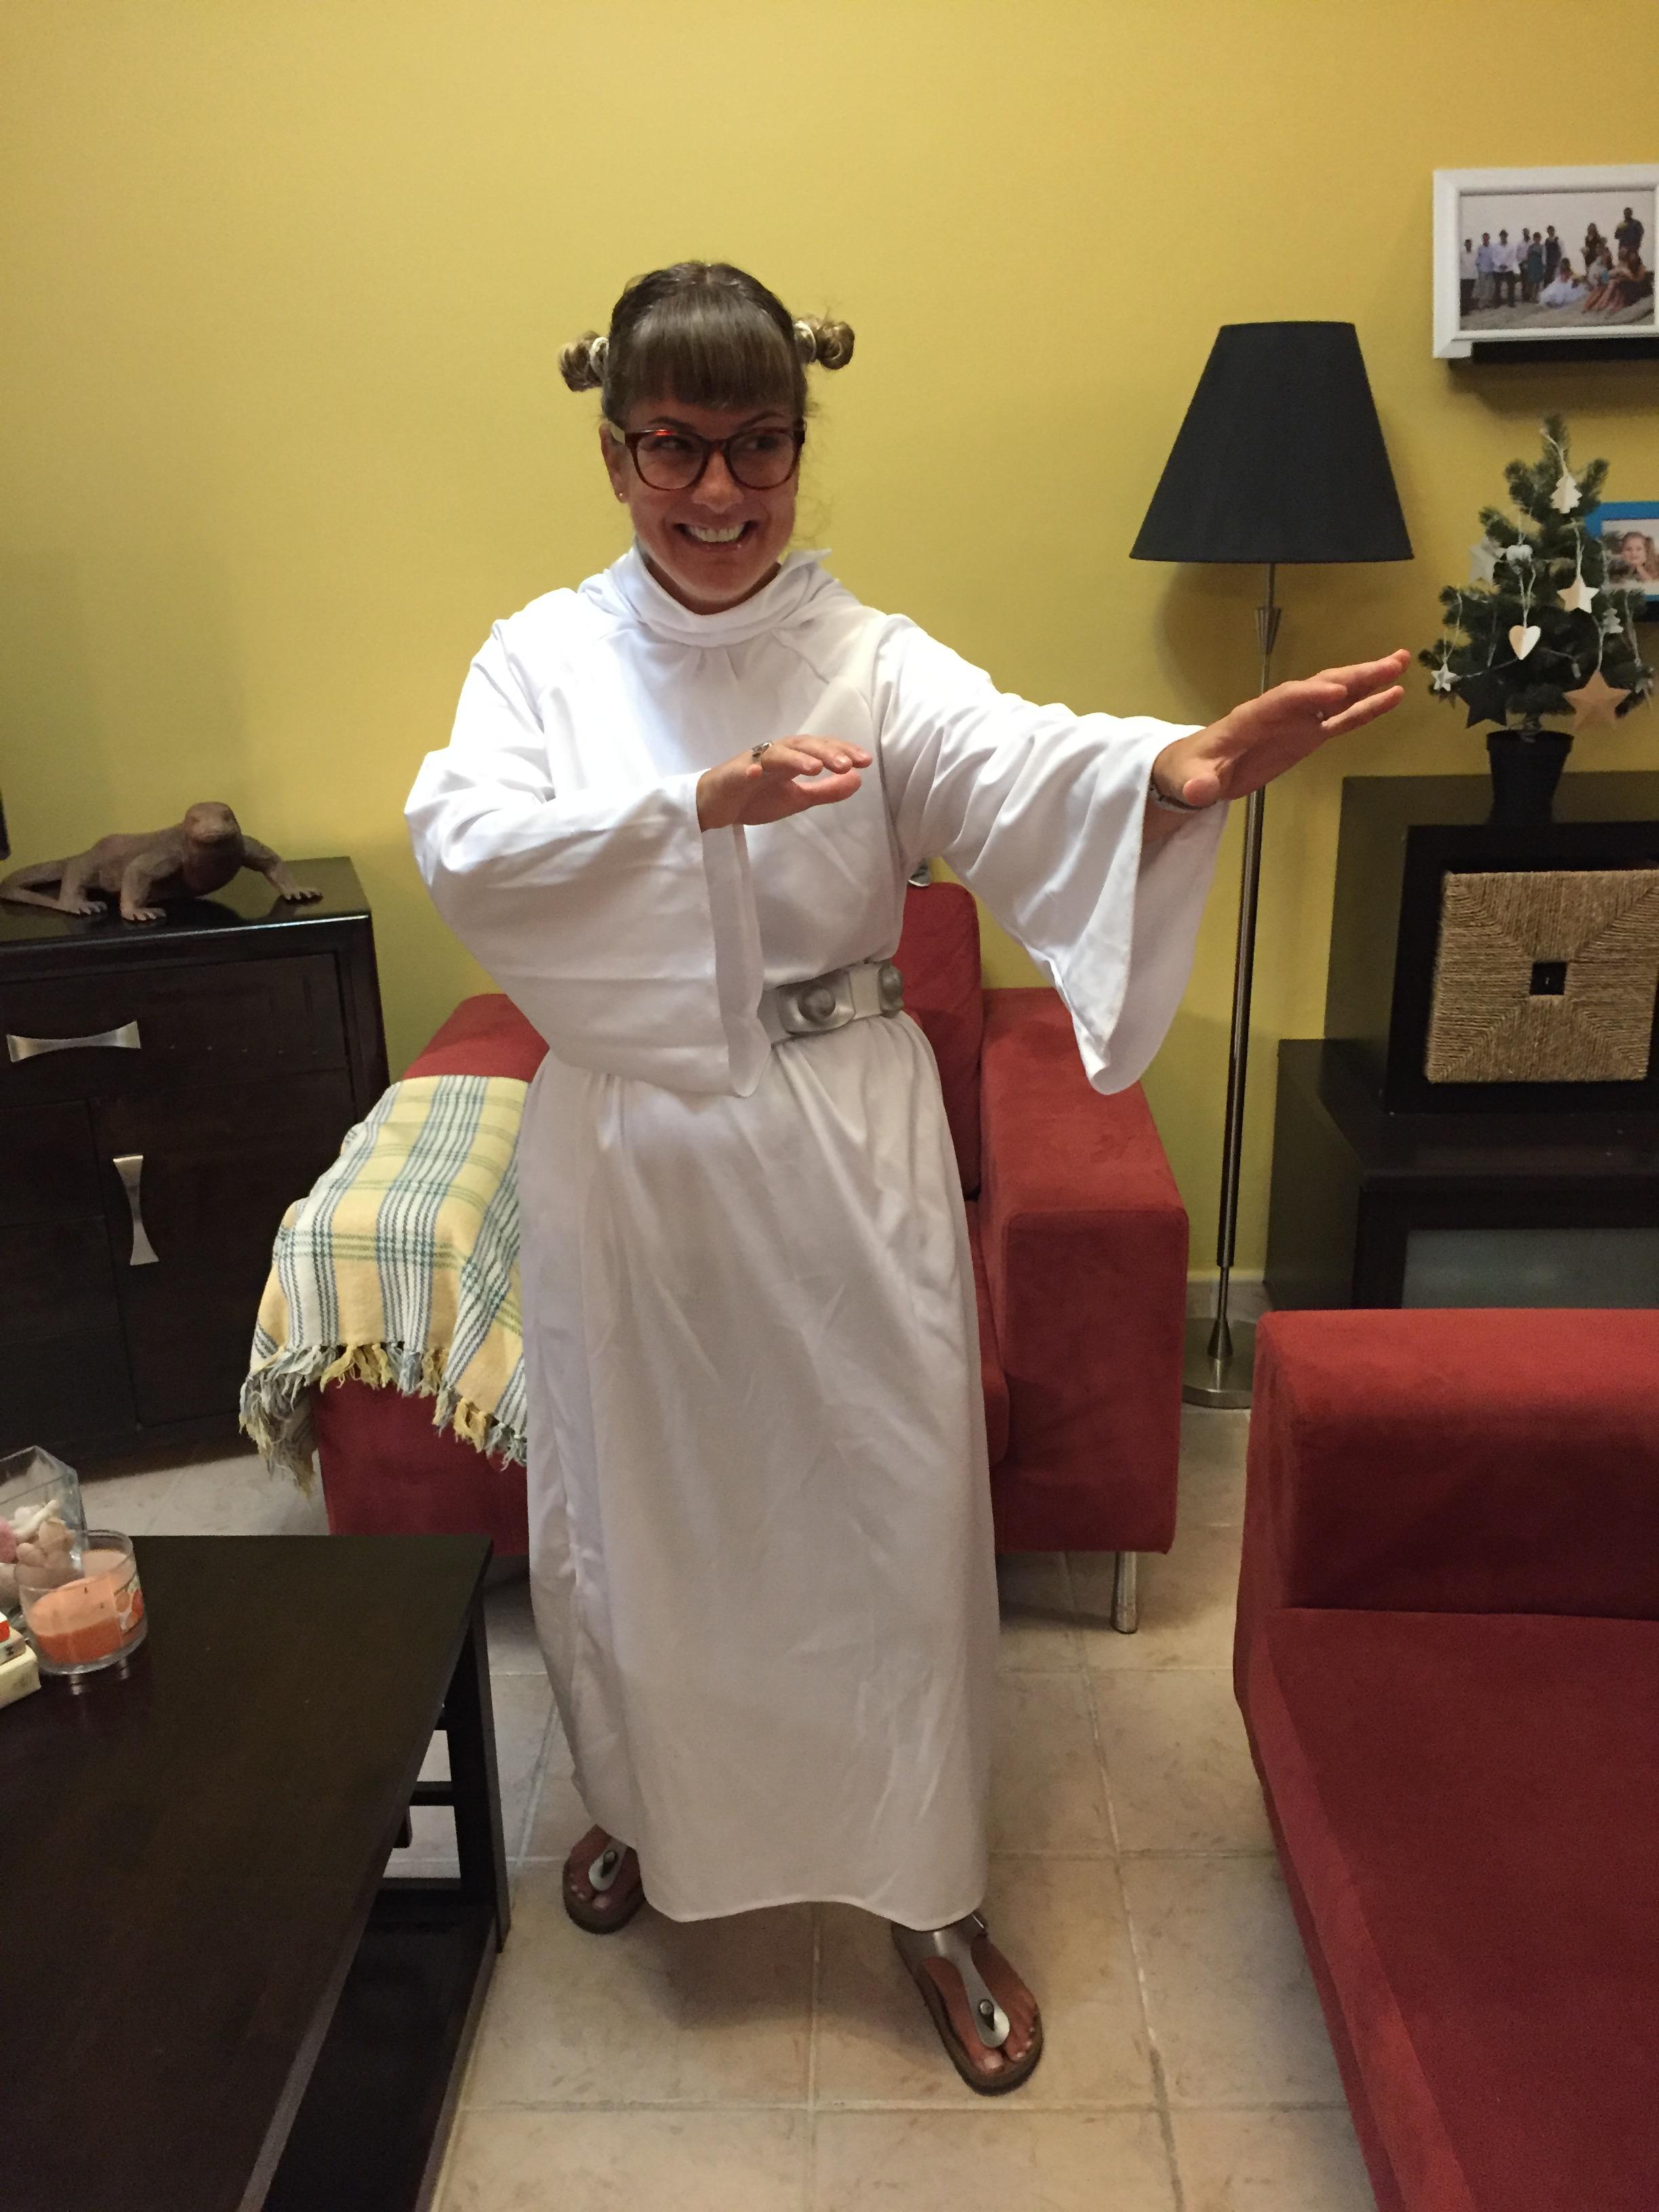 October 2016 - Doha, Qatar - Halloween day at American School of Doha - Nerd Princess Leia!